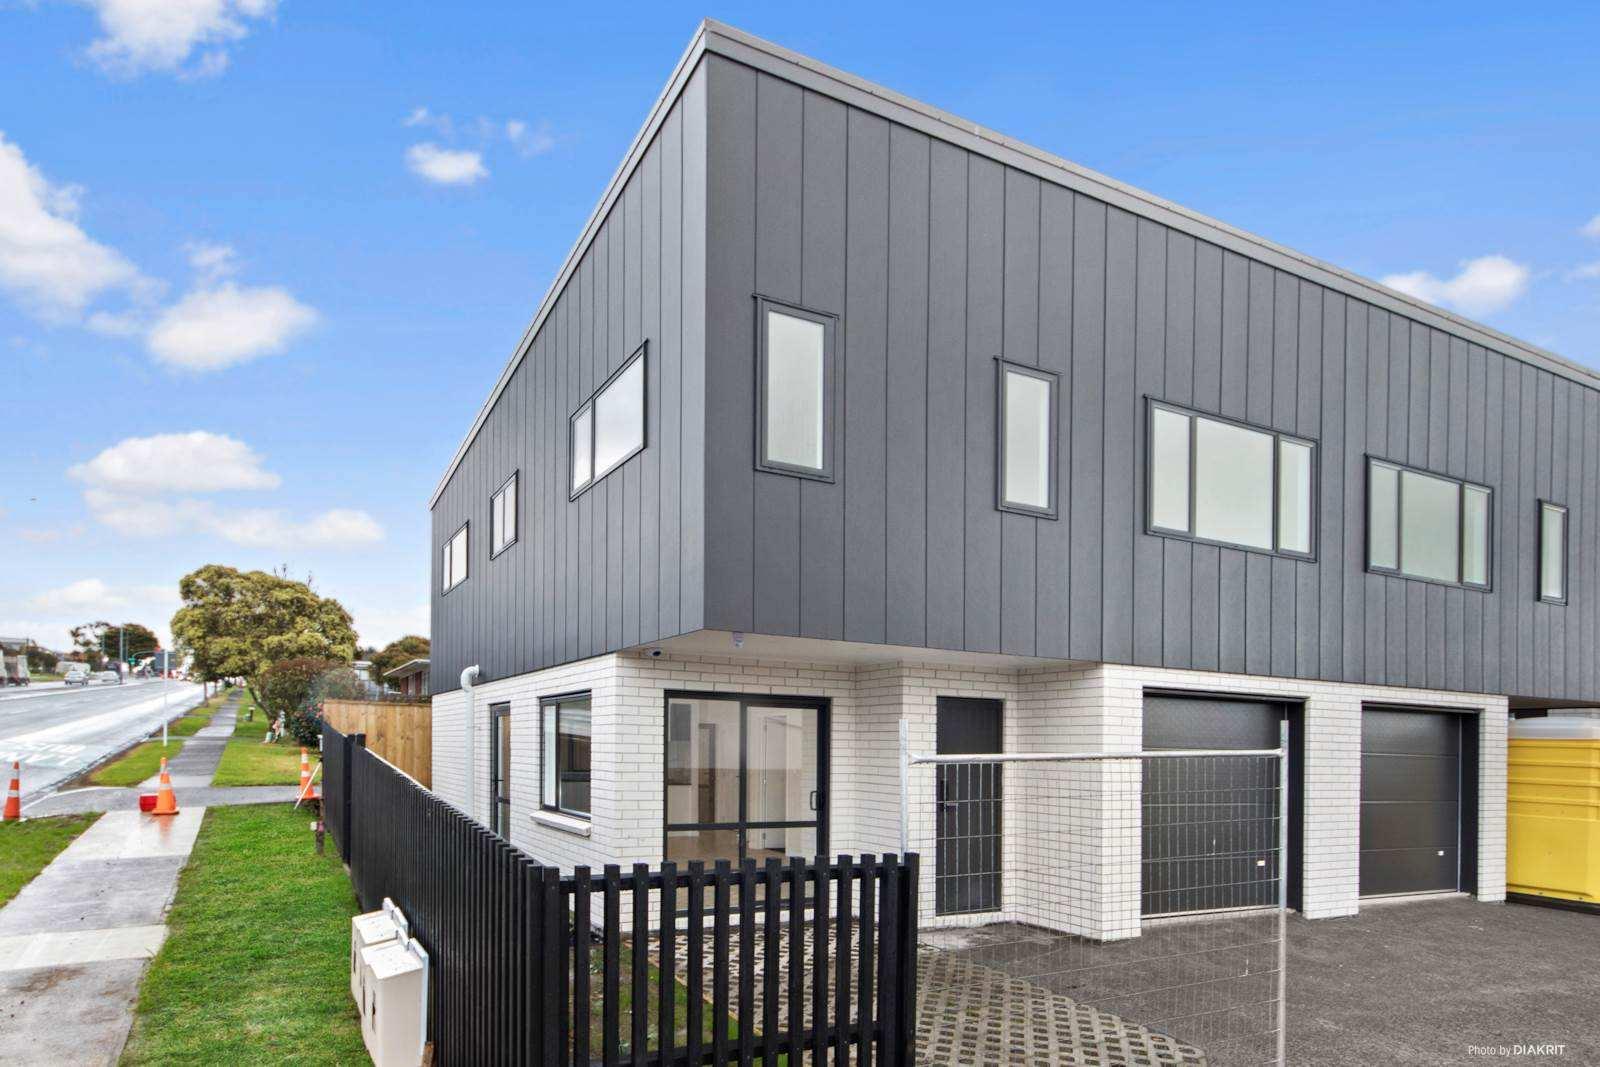 Pakuranga Heights 3房 全新独立产权住宅 130㎡全幅地 步行即至好校 靠近购物中心 10年建商质保 可轻松上高速 尽享舒适美好生活! Enviable First Home Or Smart Upgrade